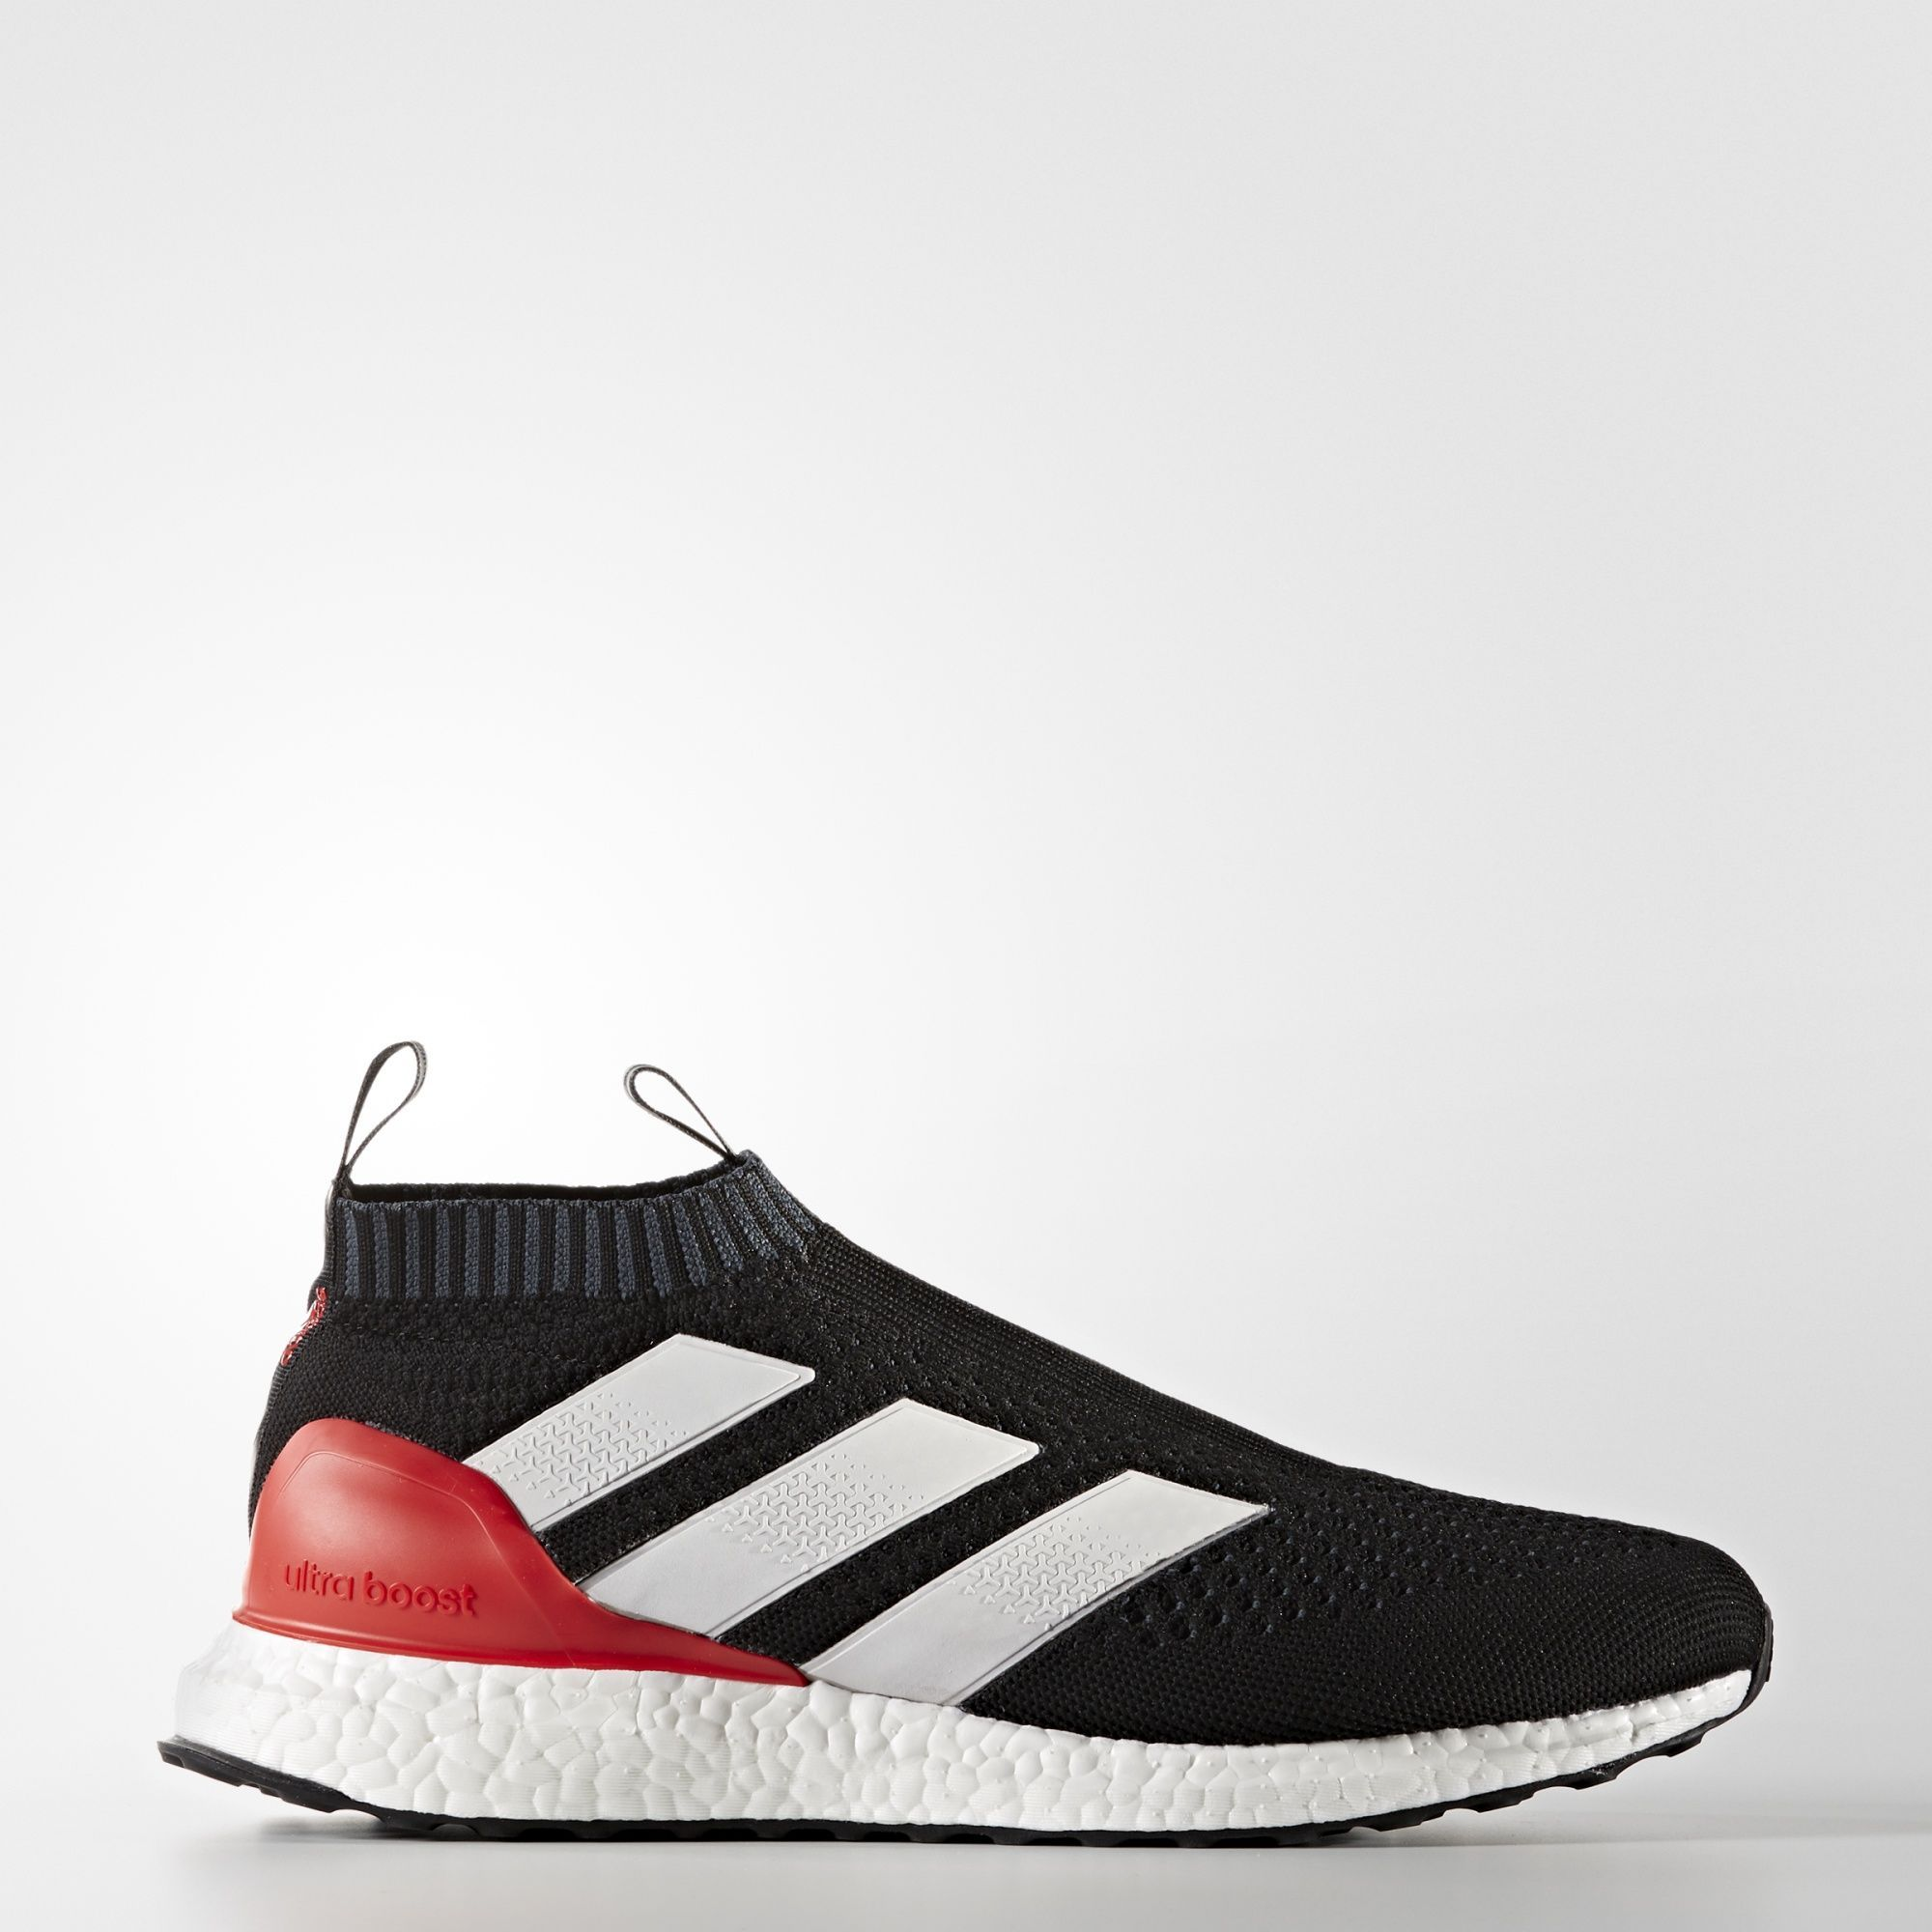 Adidas Ace 17 Purecontrol Ultra Boost Schuh 200 Boost Schuhe Sneakers Mode Nike Schuhe Damen